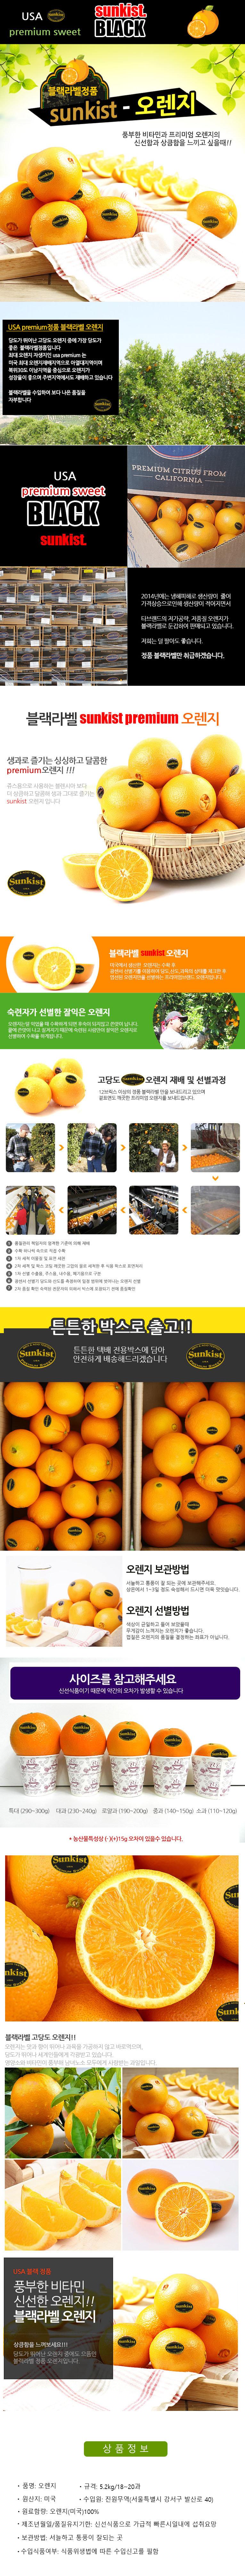 orangblack_page_5.2kg.jpg